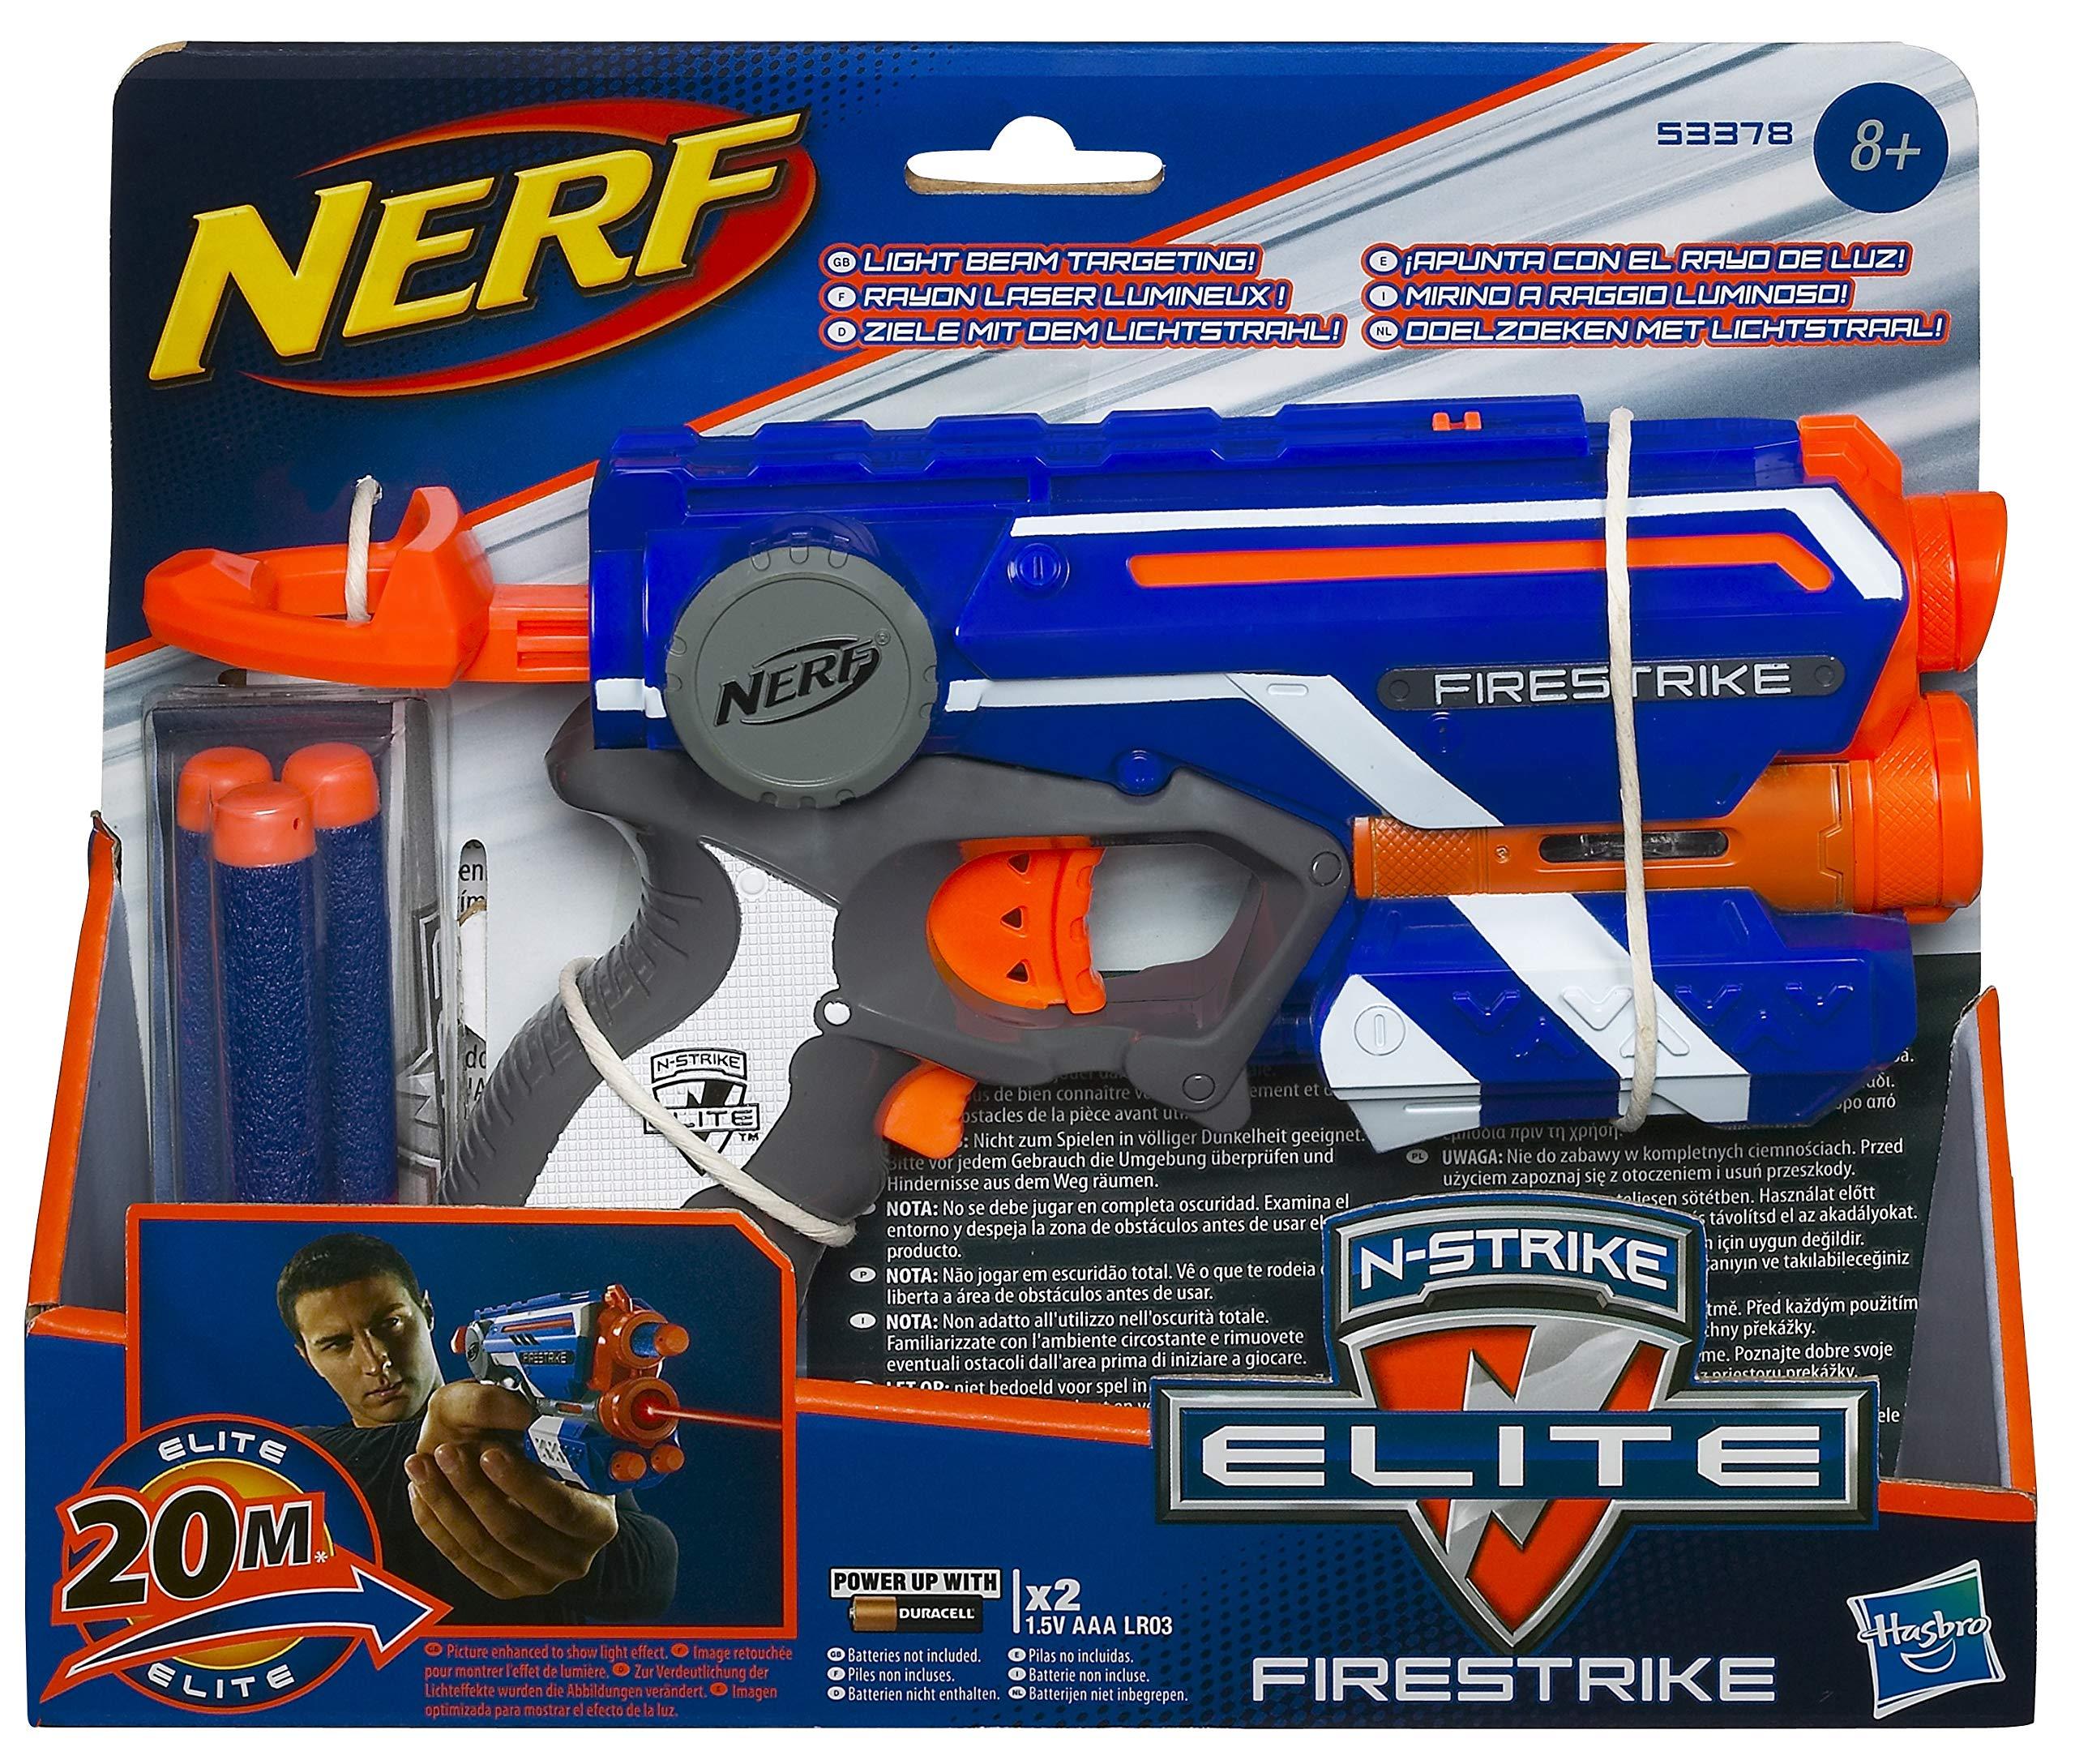 Nerf - Lanzadardos Firestrike Elite (Hasbro 53378E35) product image